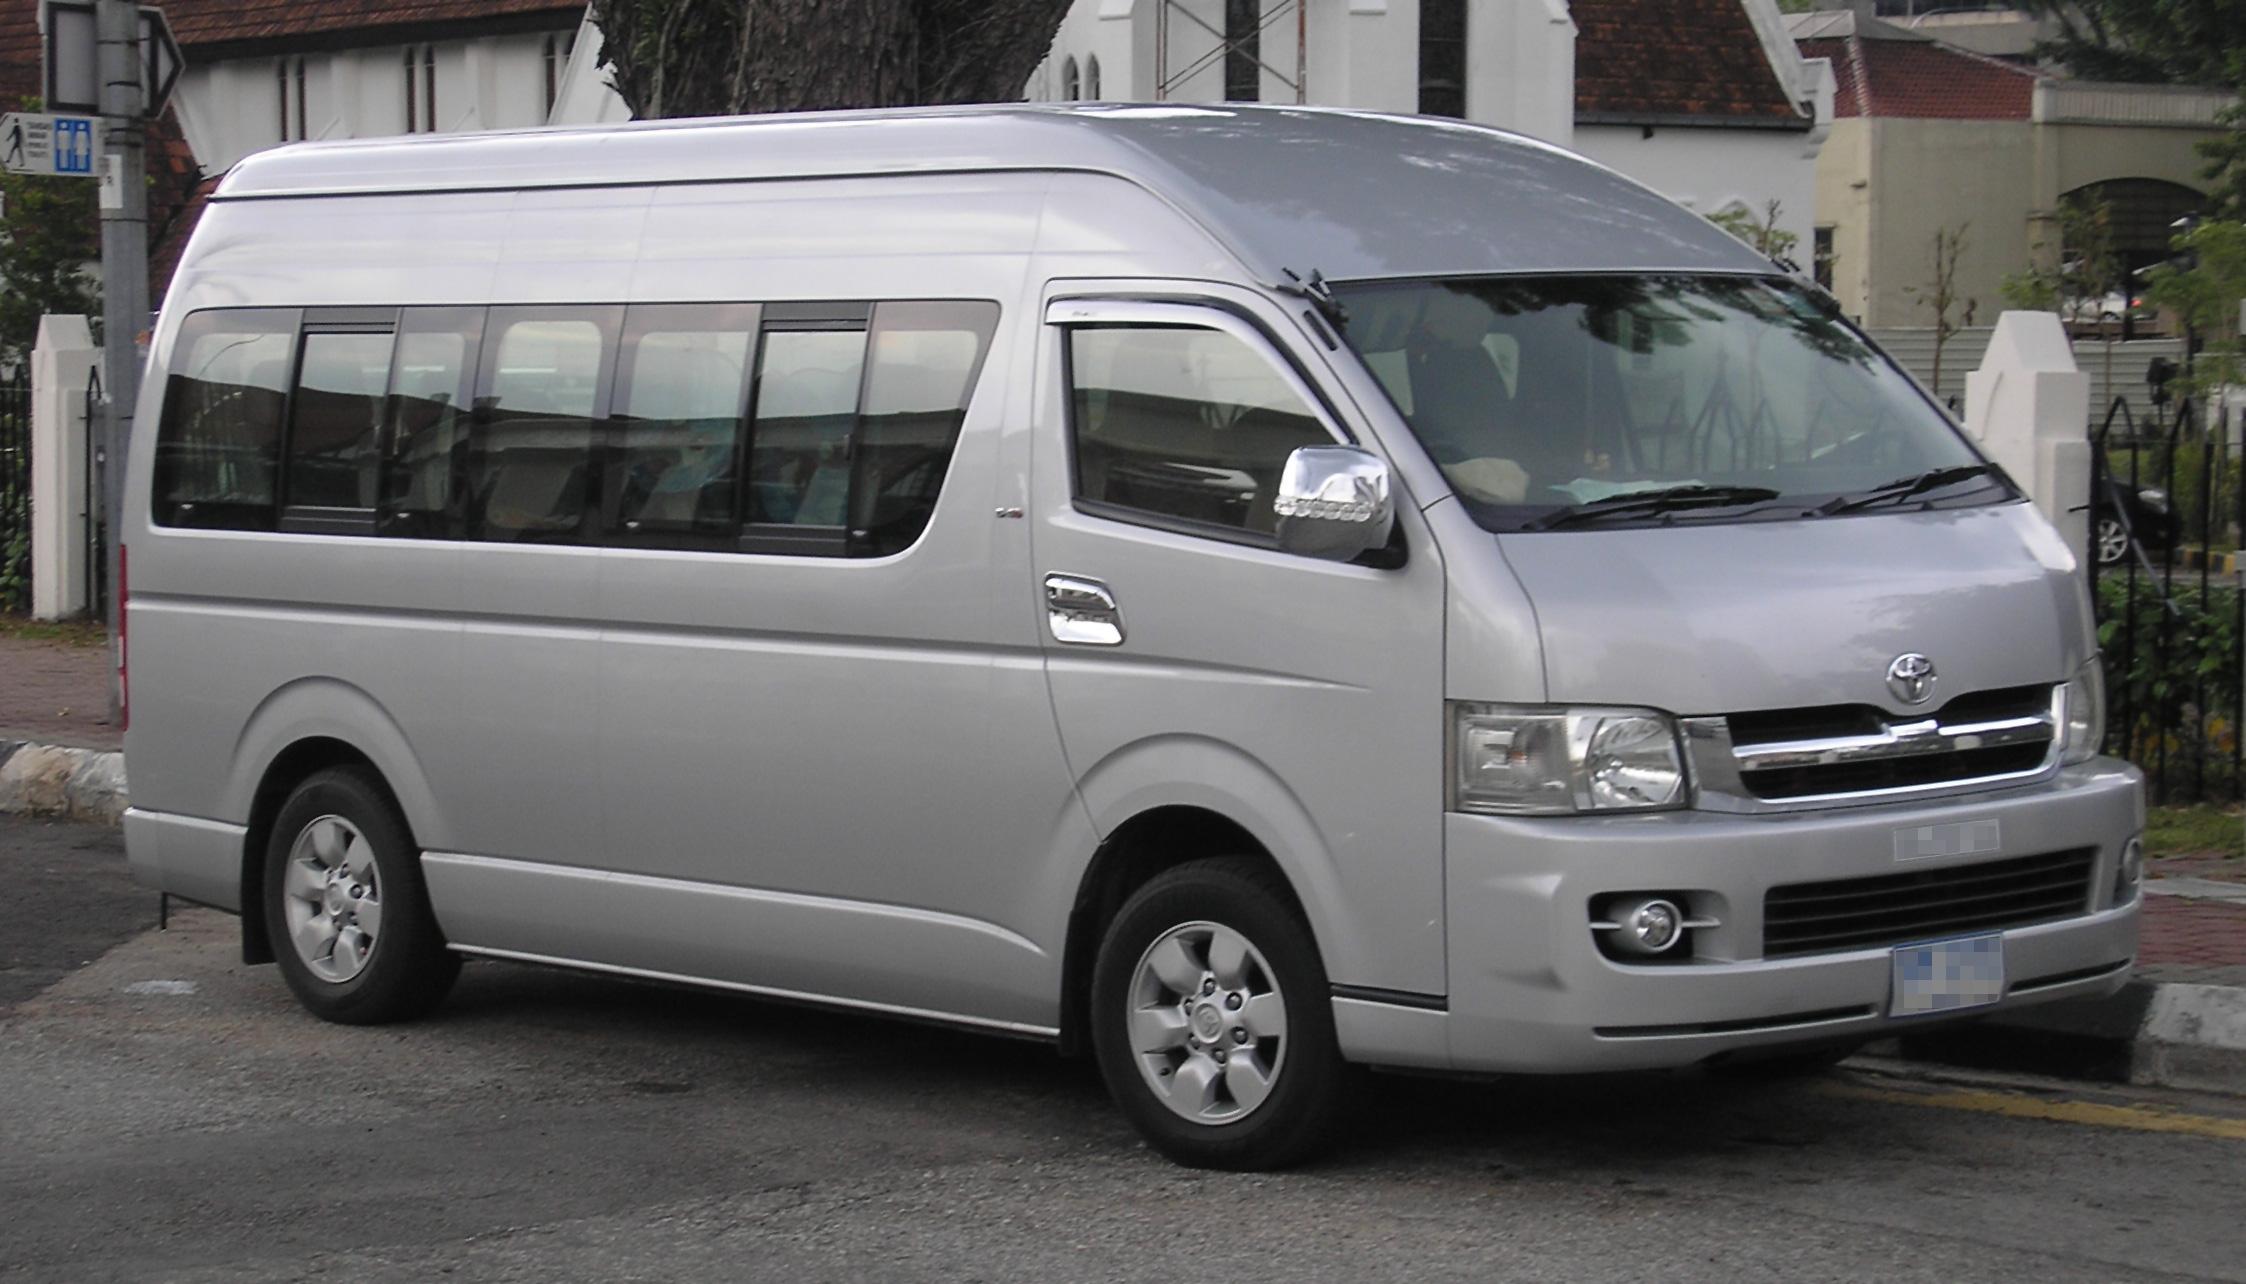 Nissan Work Van >> File:Toyota Hiace (fifth generation) (Grand Cabin) (front), Kuala Lumpur.jpg - Wikimedia Commons